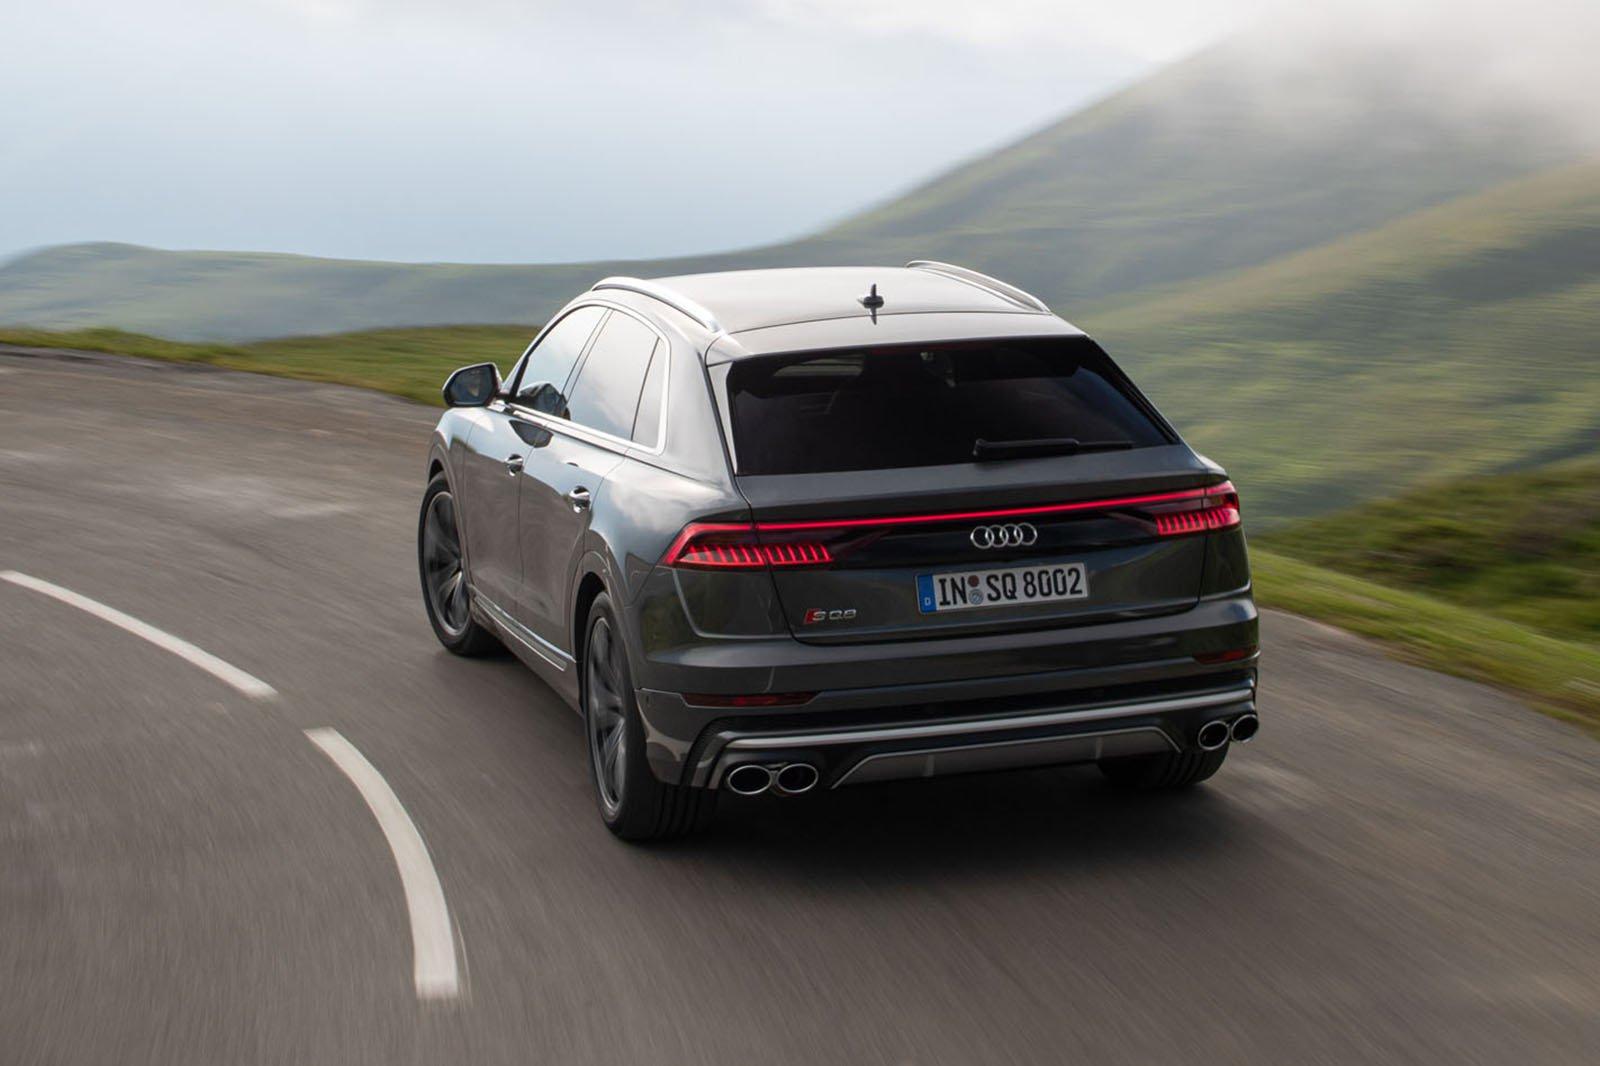 Audi SQ8 2019 rear tracking shot